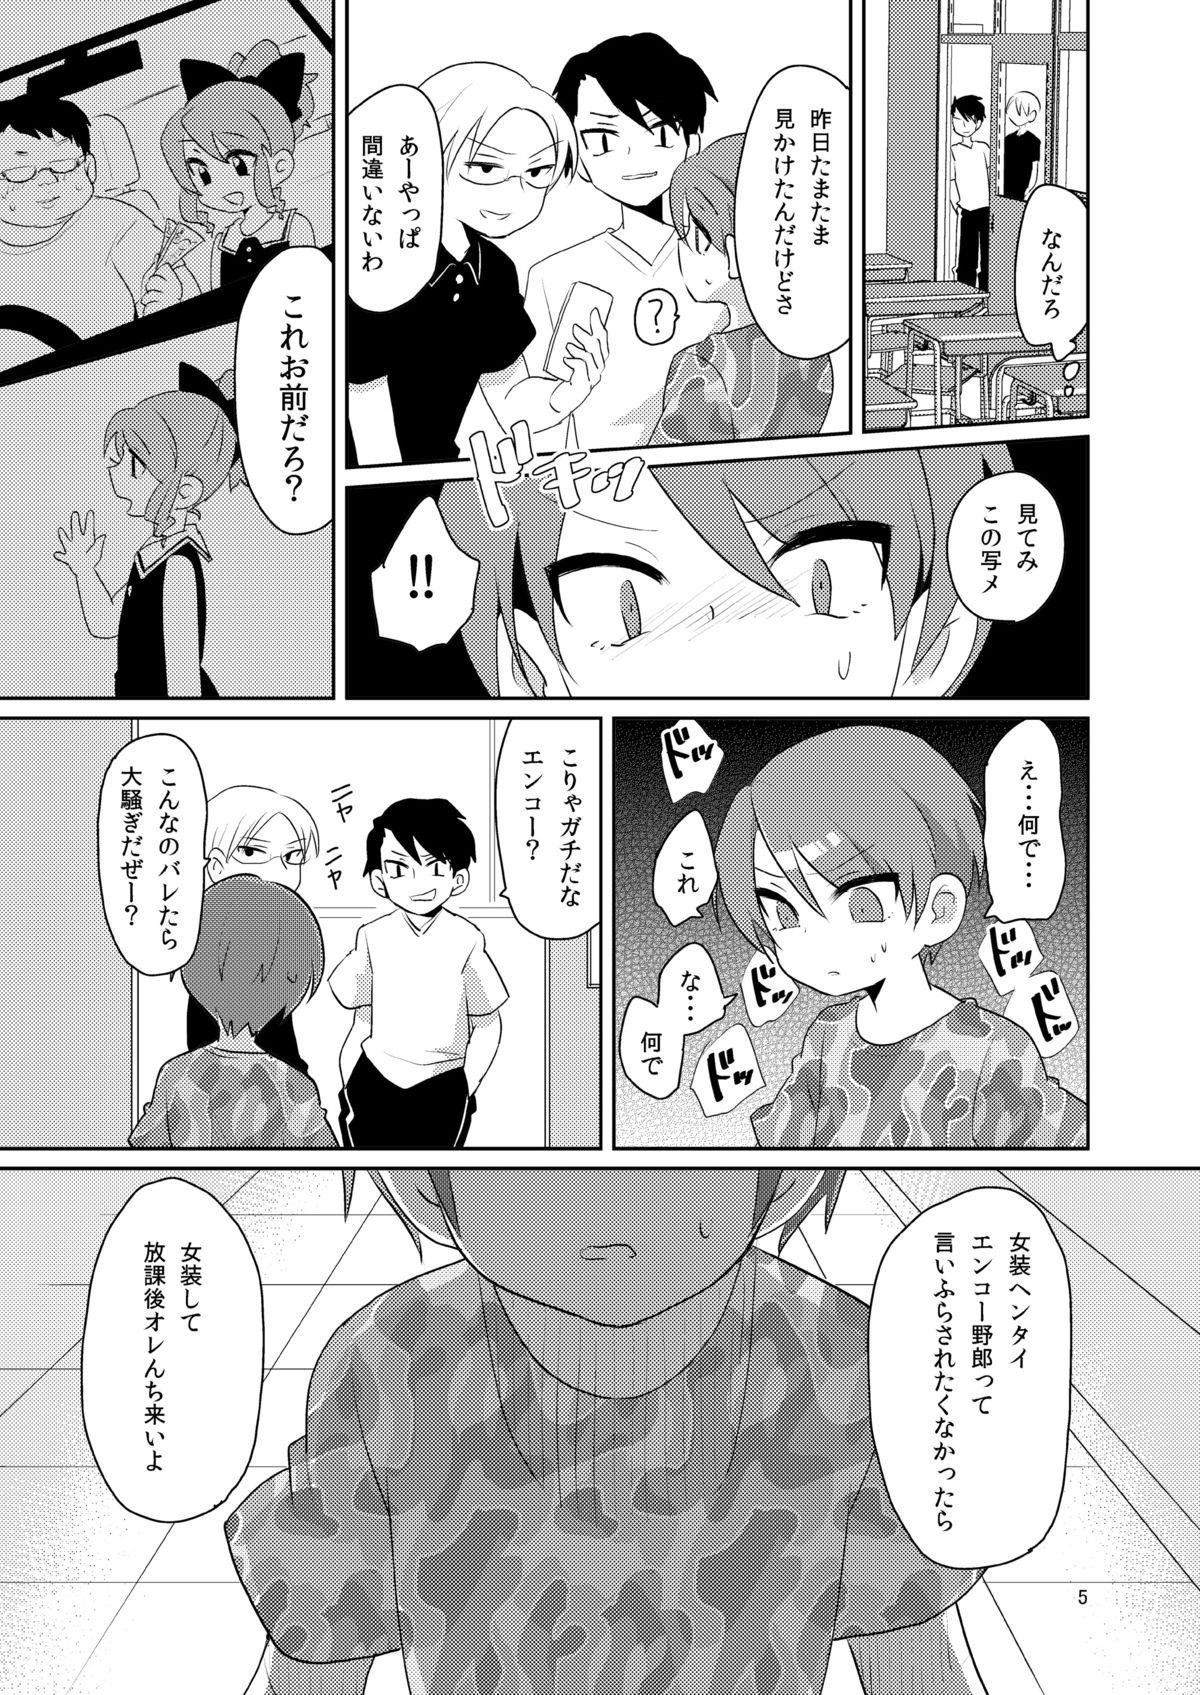 Sokuochi In Boy 5